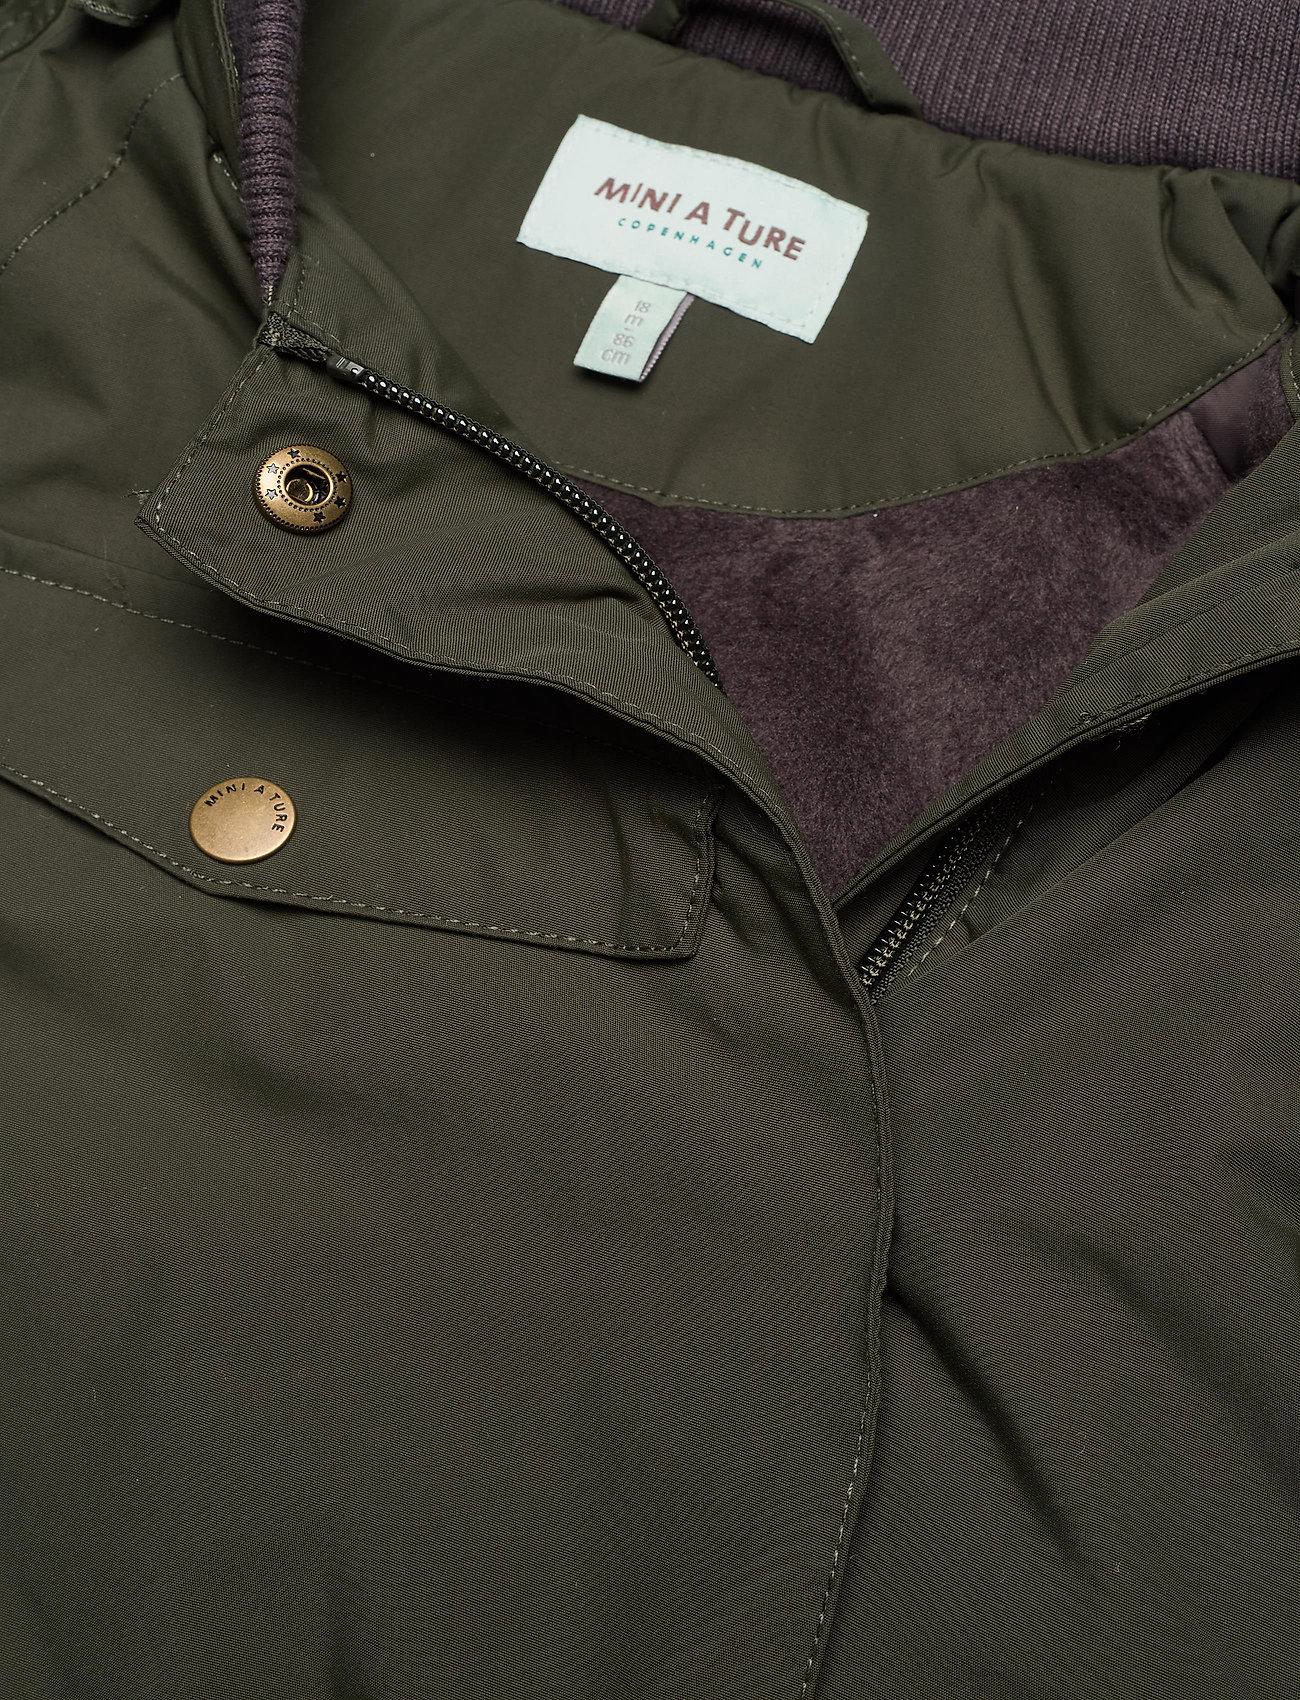 Mini A Ture - Wang Fake Fur Jacket, M - winter jacket - deep depths - 0